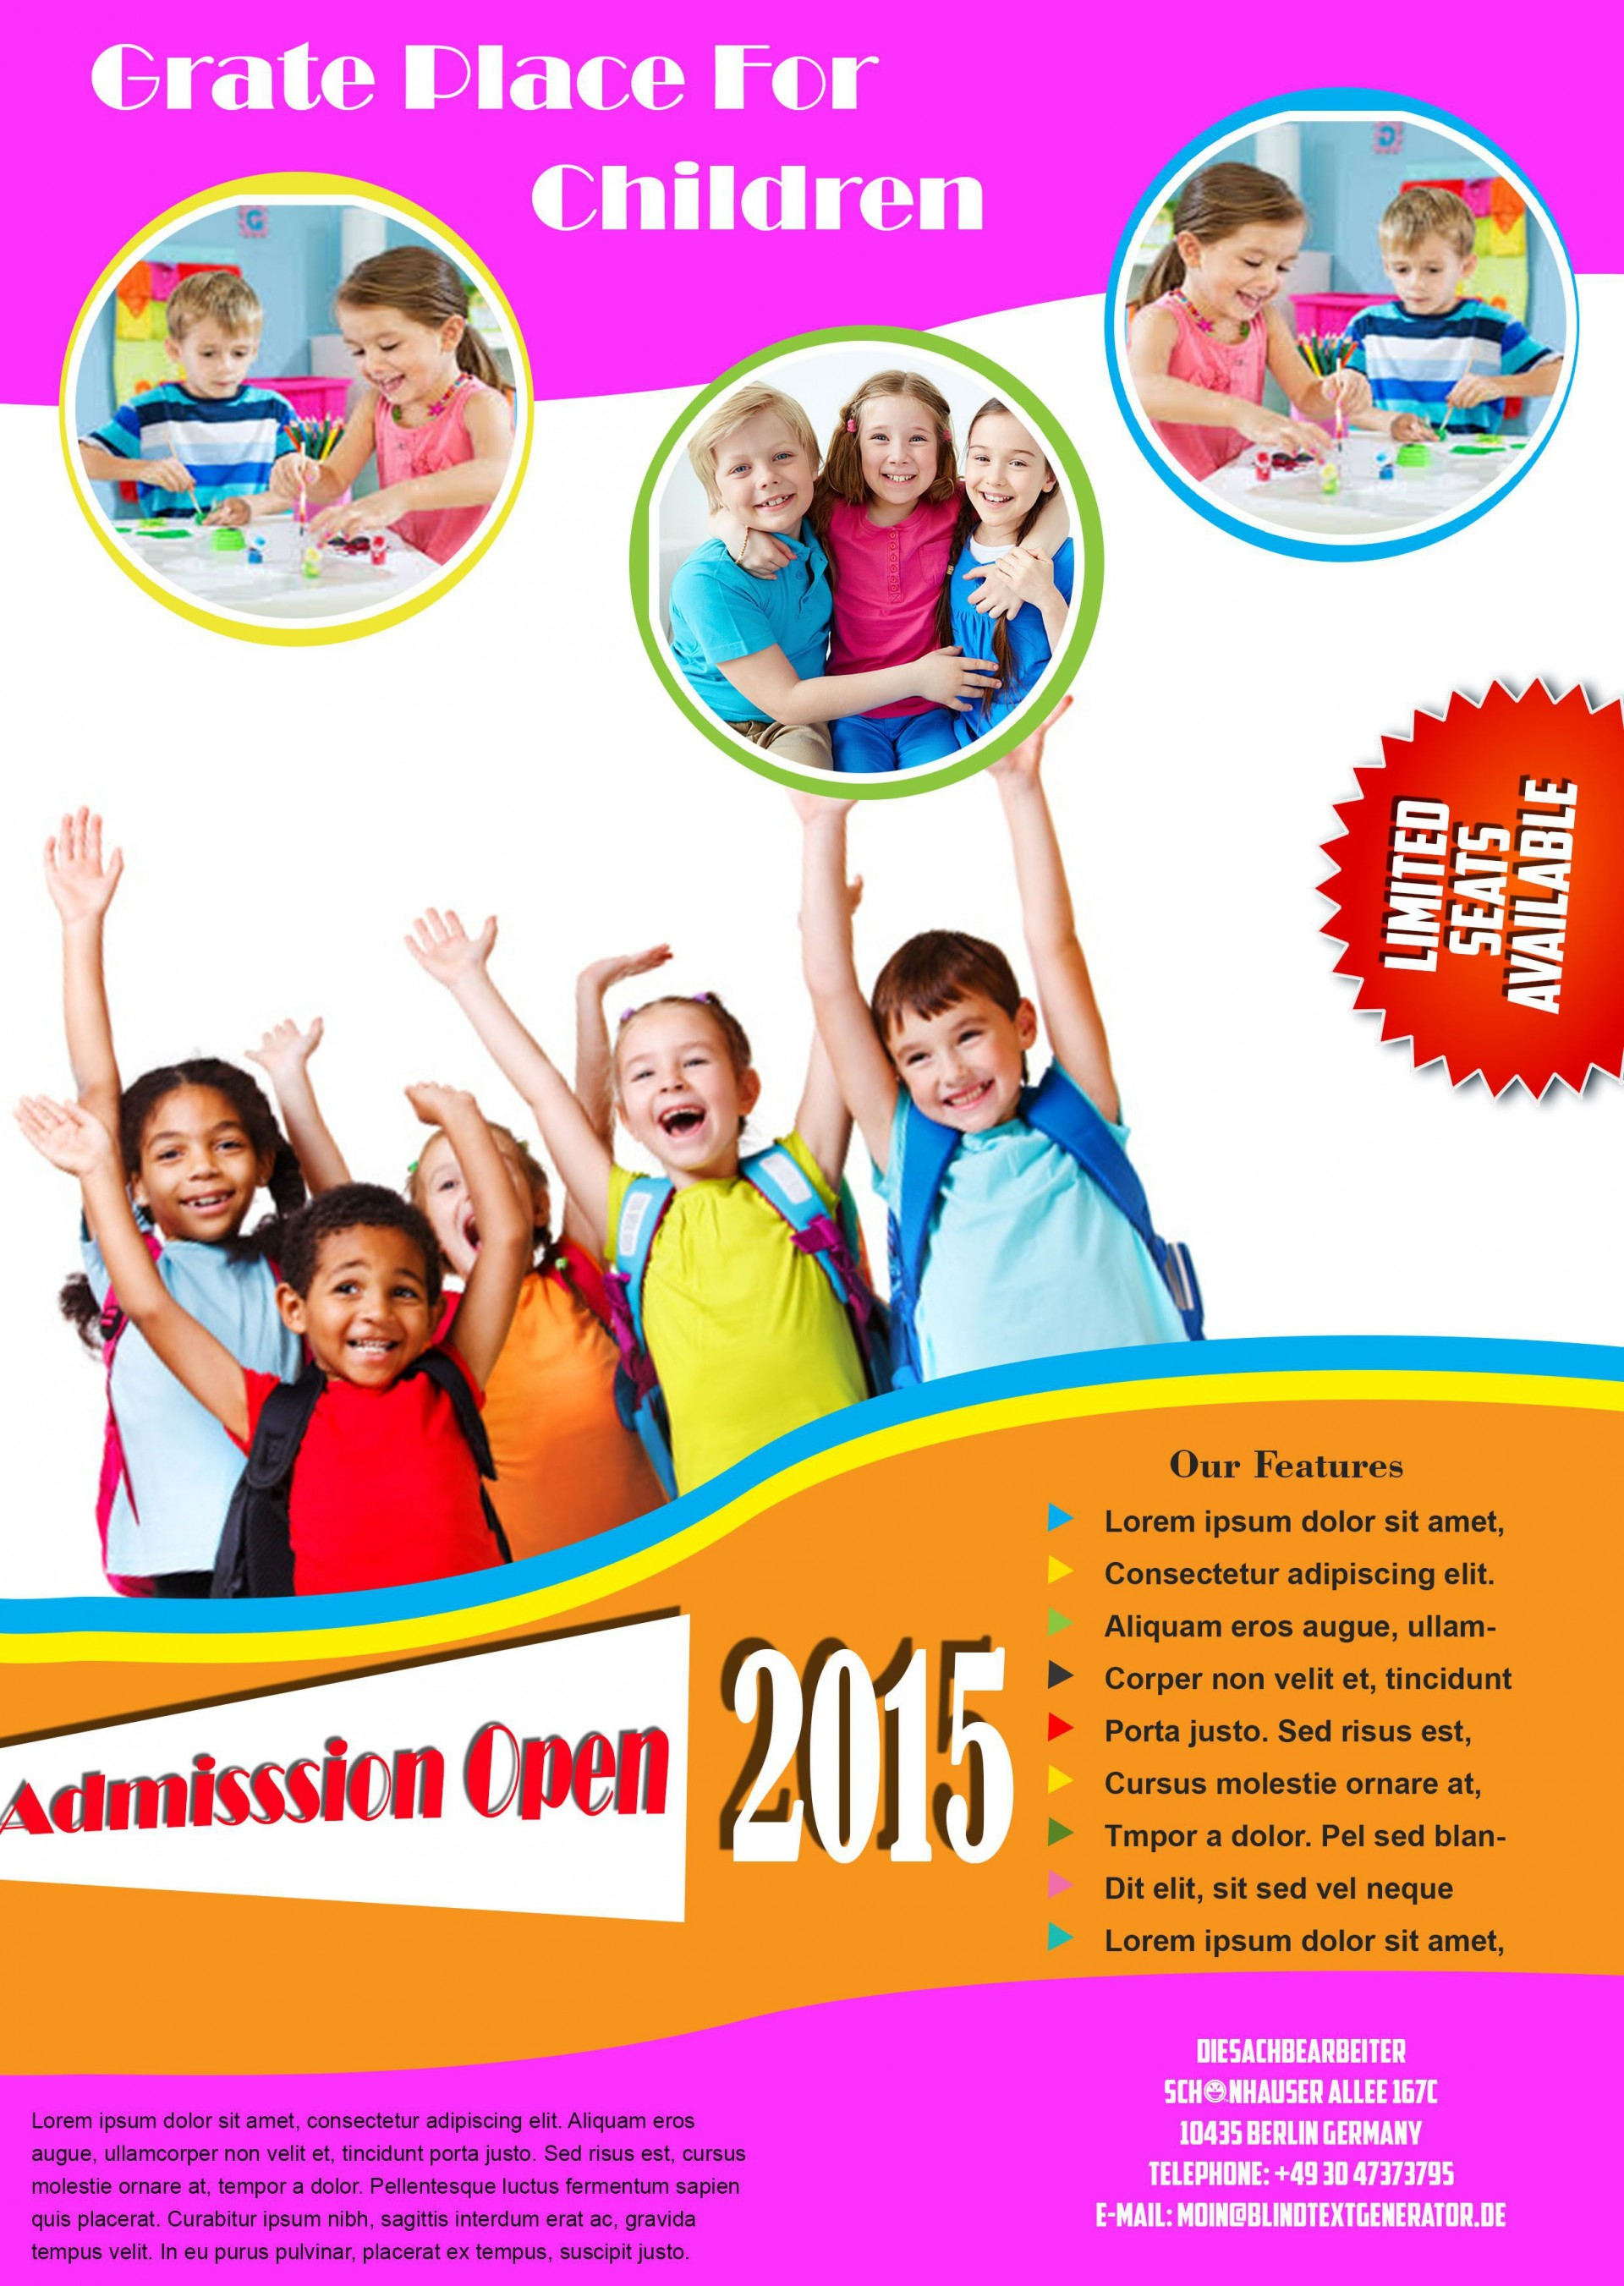 007 Sensational Free School Flyer Design Template Example  Templates Creative Education Poster1920